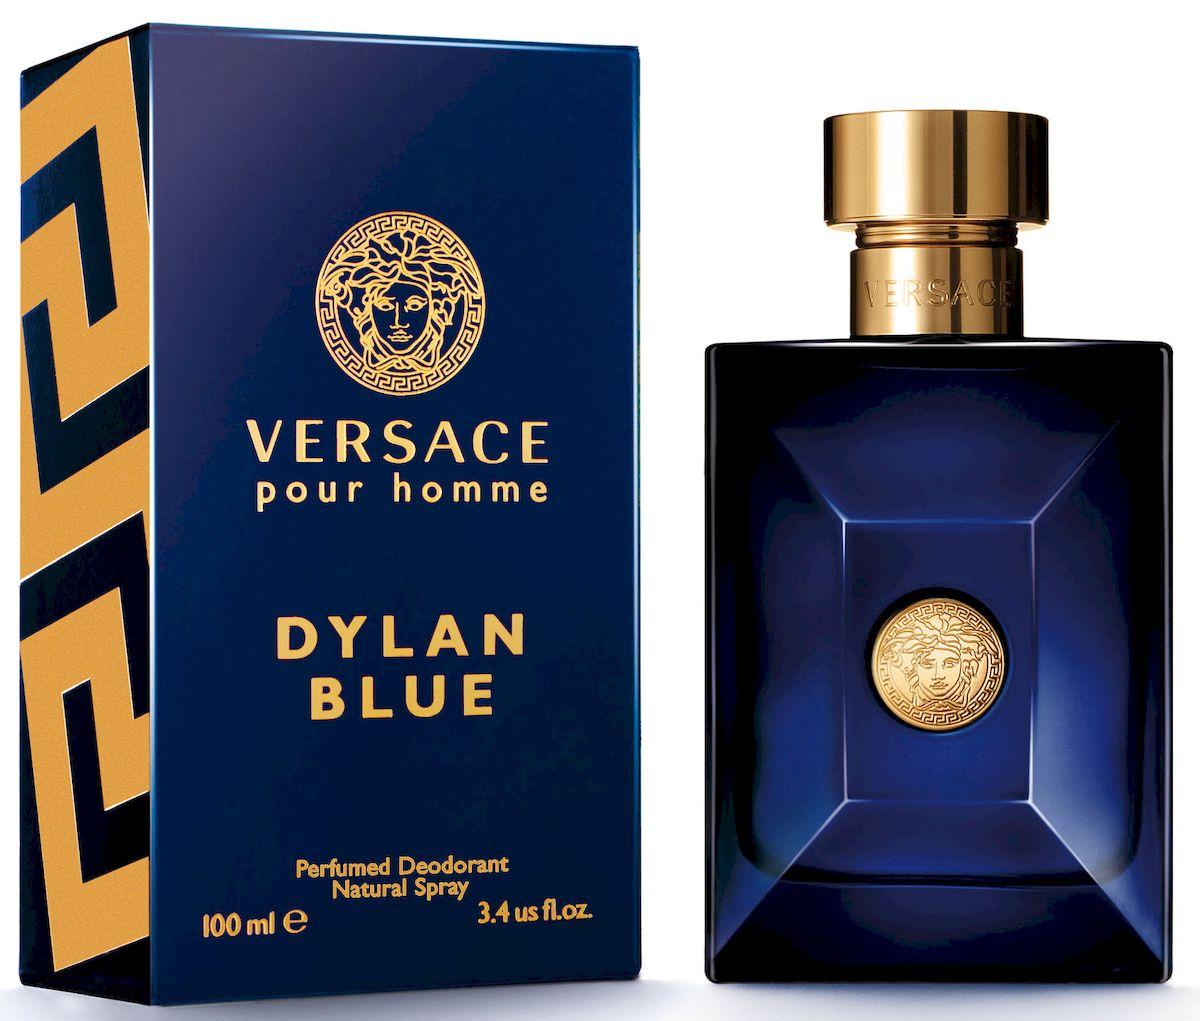 Versace Dylan Blue Дезодорант спрей 100 мл